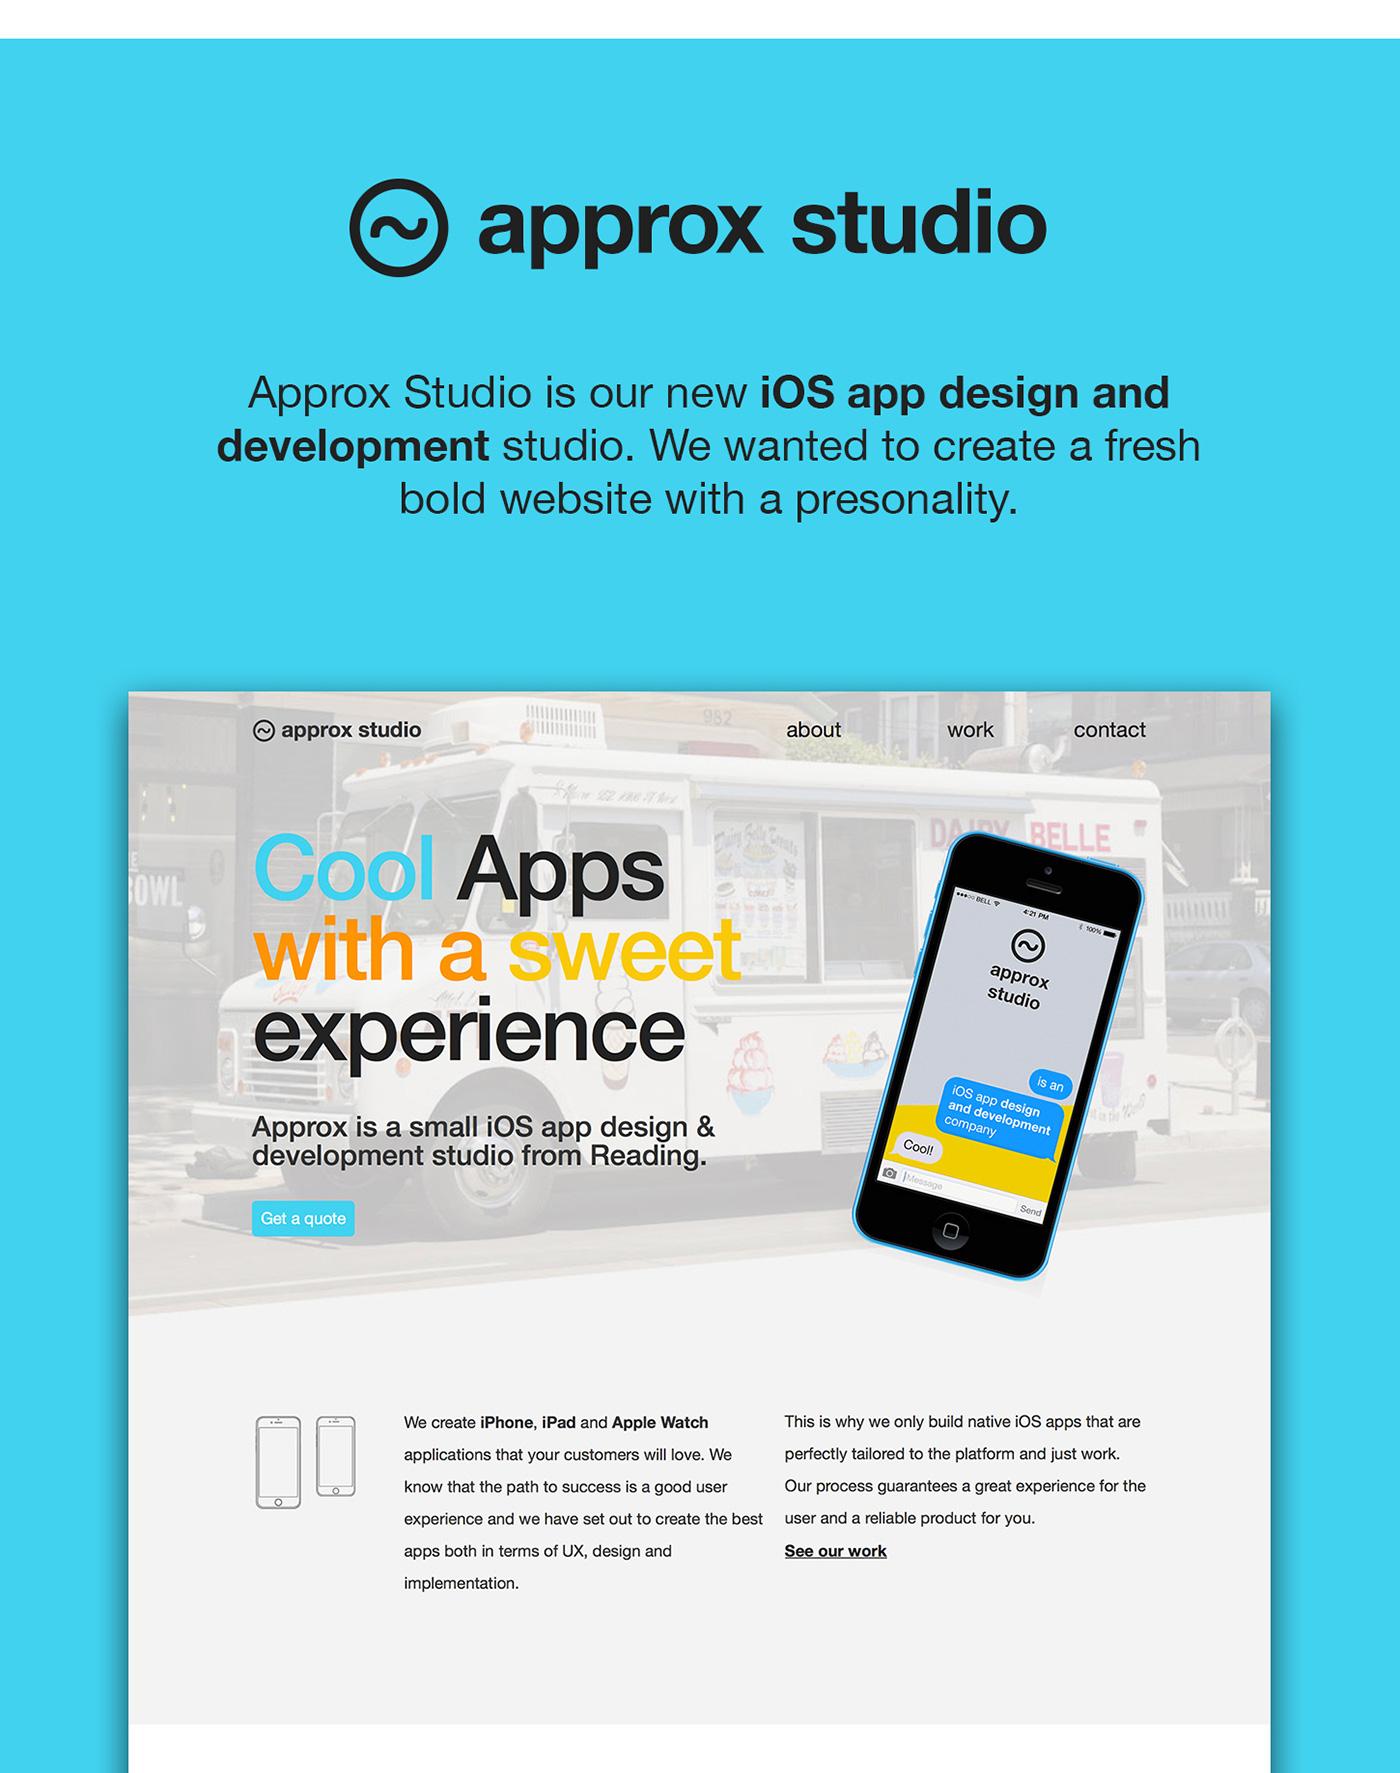 Web Webdesign Responsive ios iphone iPad apple watch developer app css